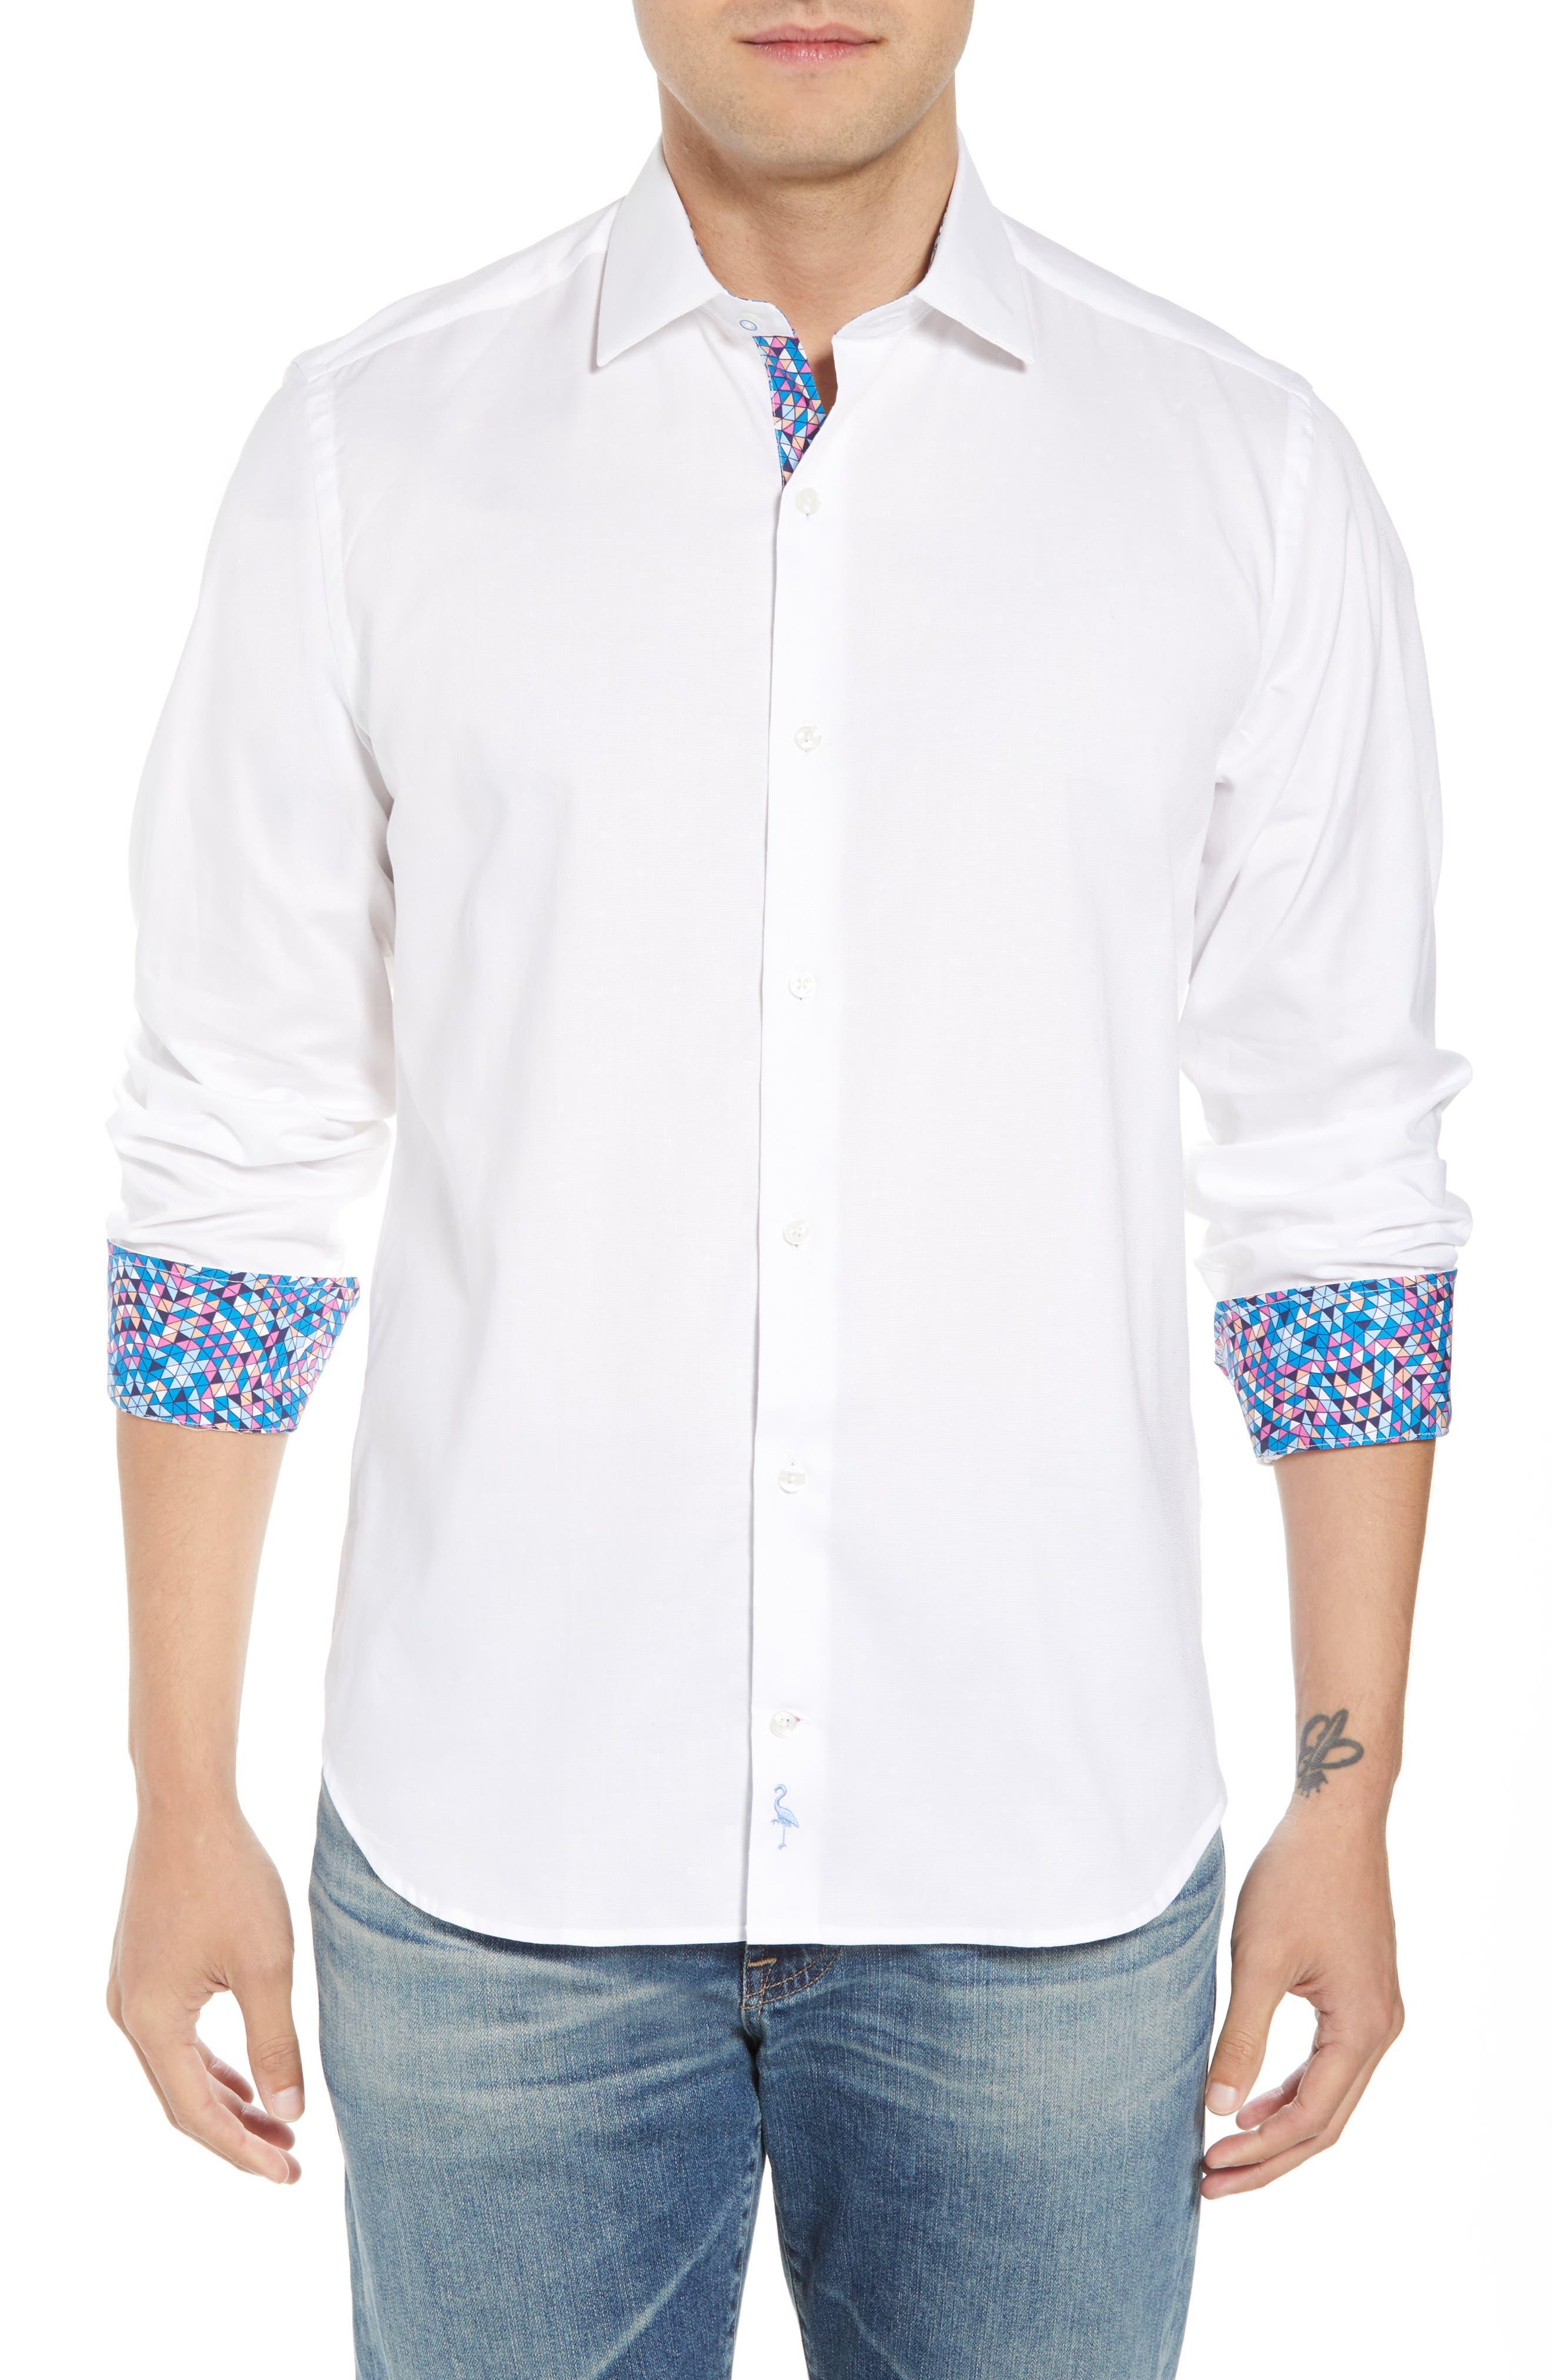 Baxley Regular Fit Sport Shirt,                         Main,                         color, White